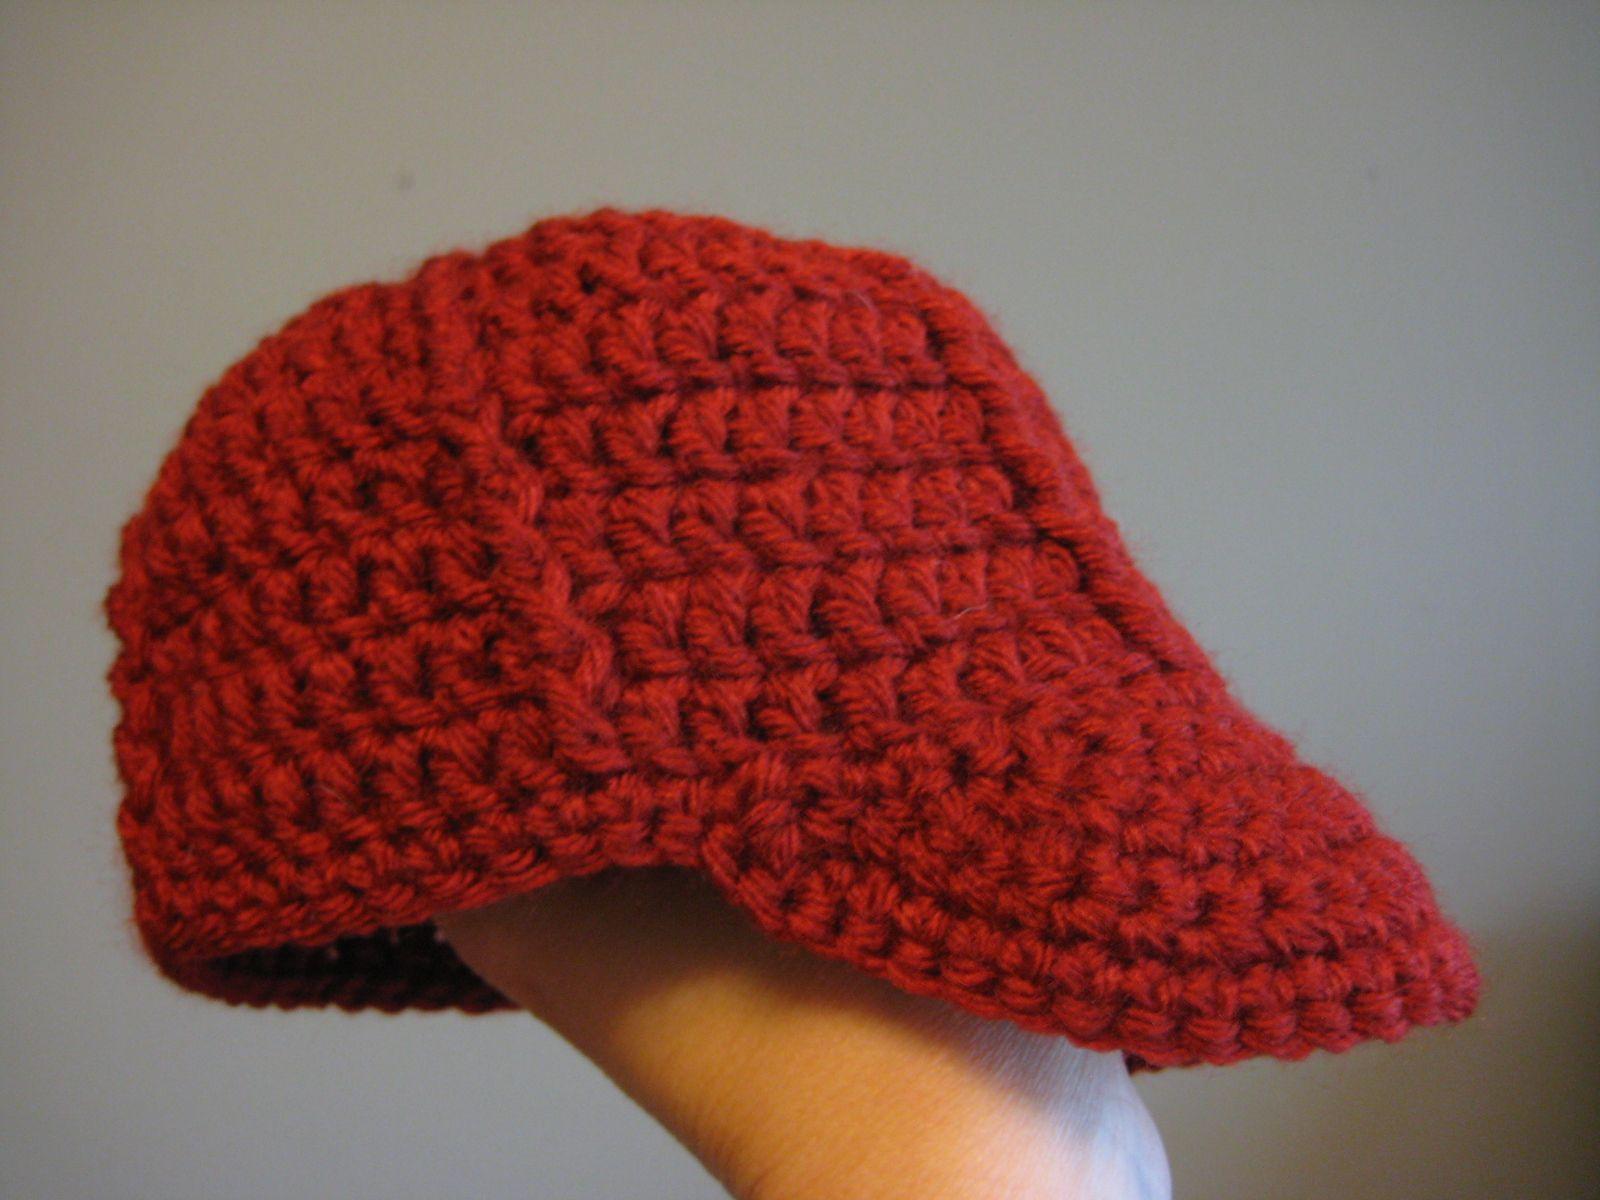 Dress Crochet Patterns For Teens Crochet Baseball Hat Pictures